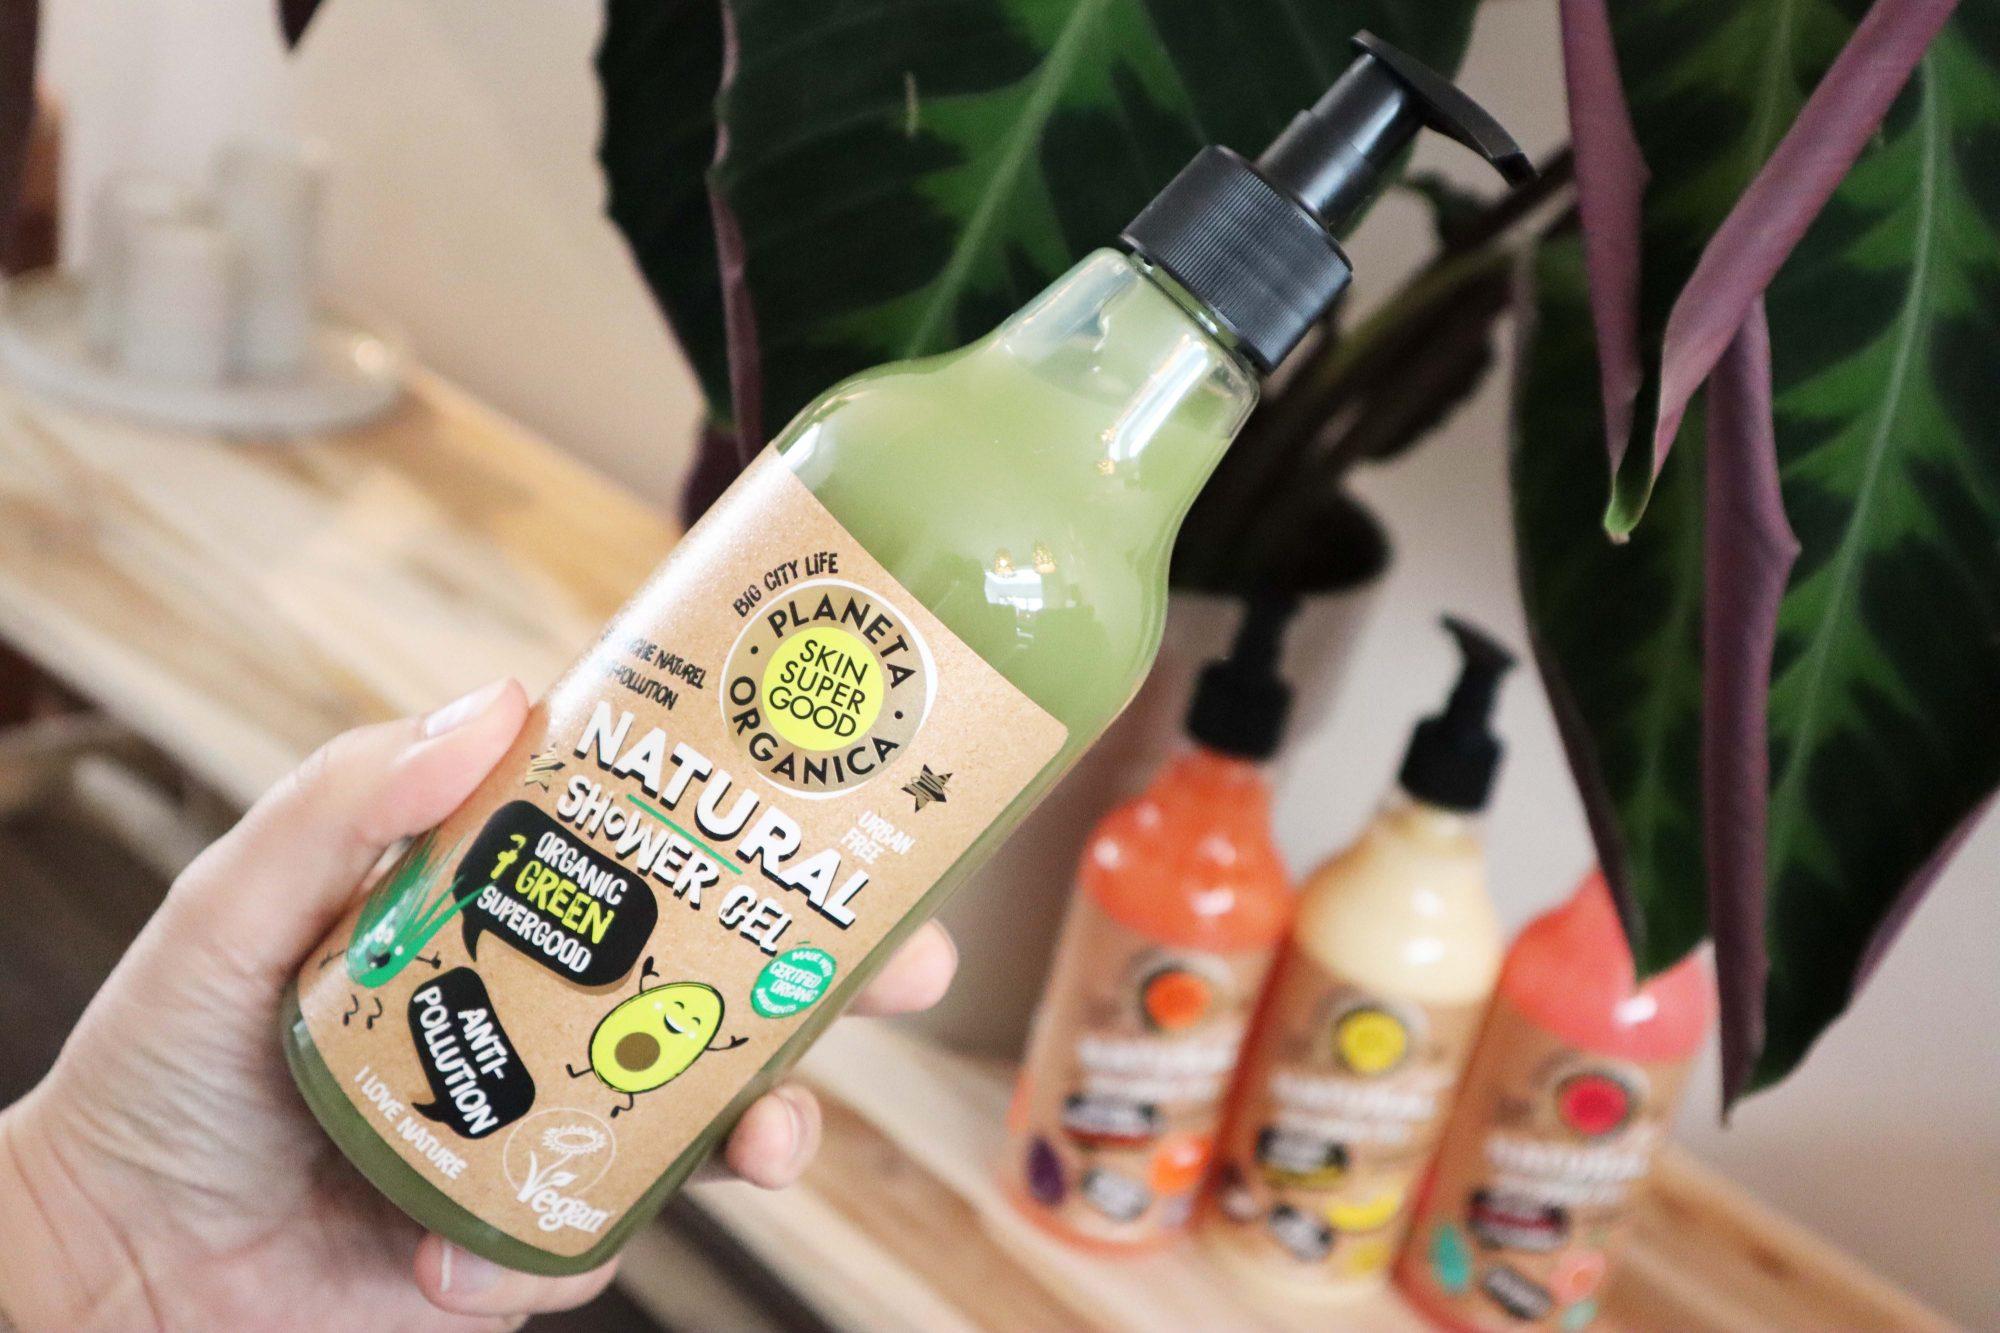 Planeta Organica Skin Super Good Natural Showergels